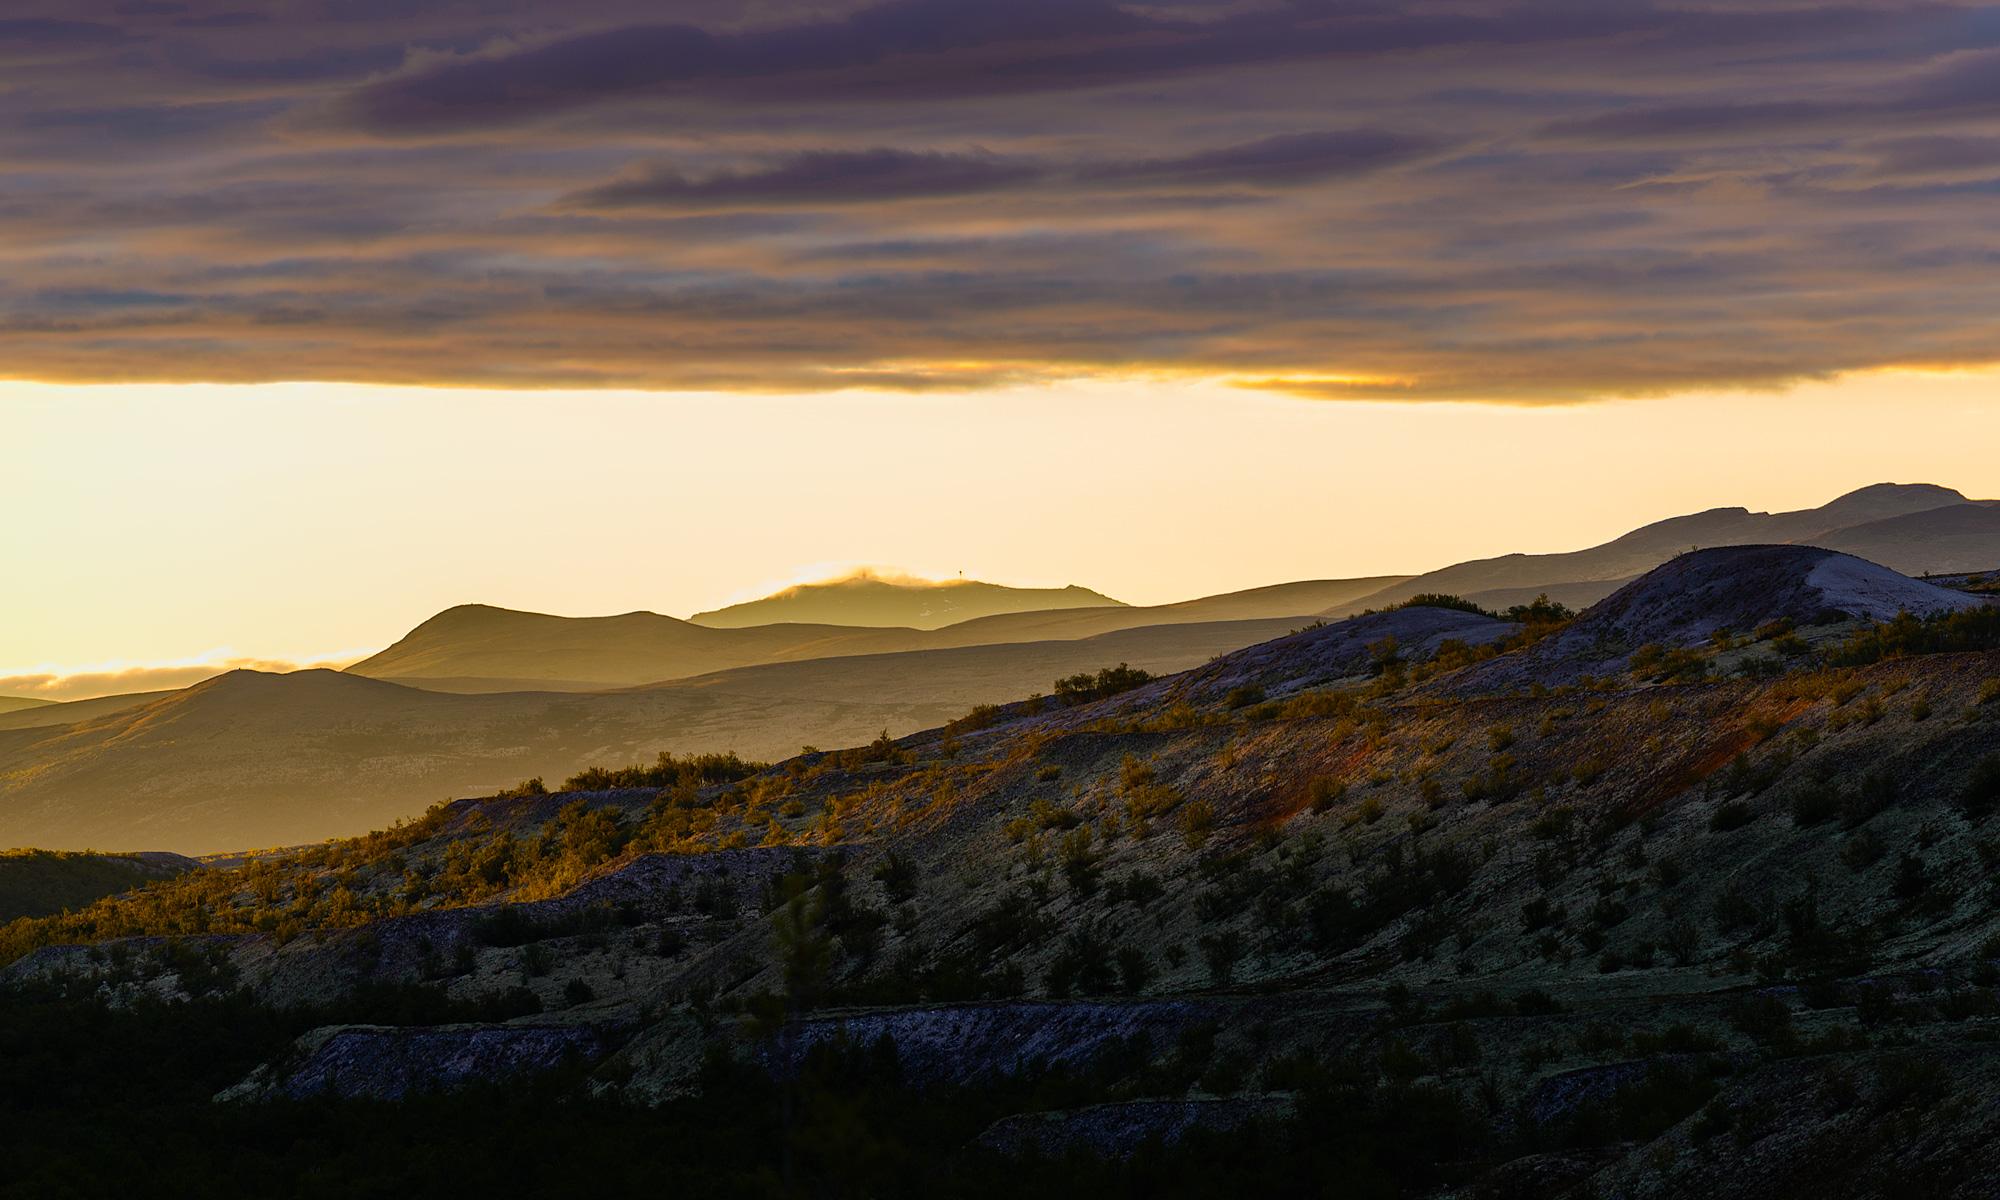 Sunrise over the mountains near Dørålseter, Rondane Nationalpark, Norway – Landscape Photography